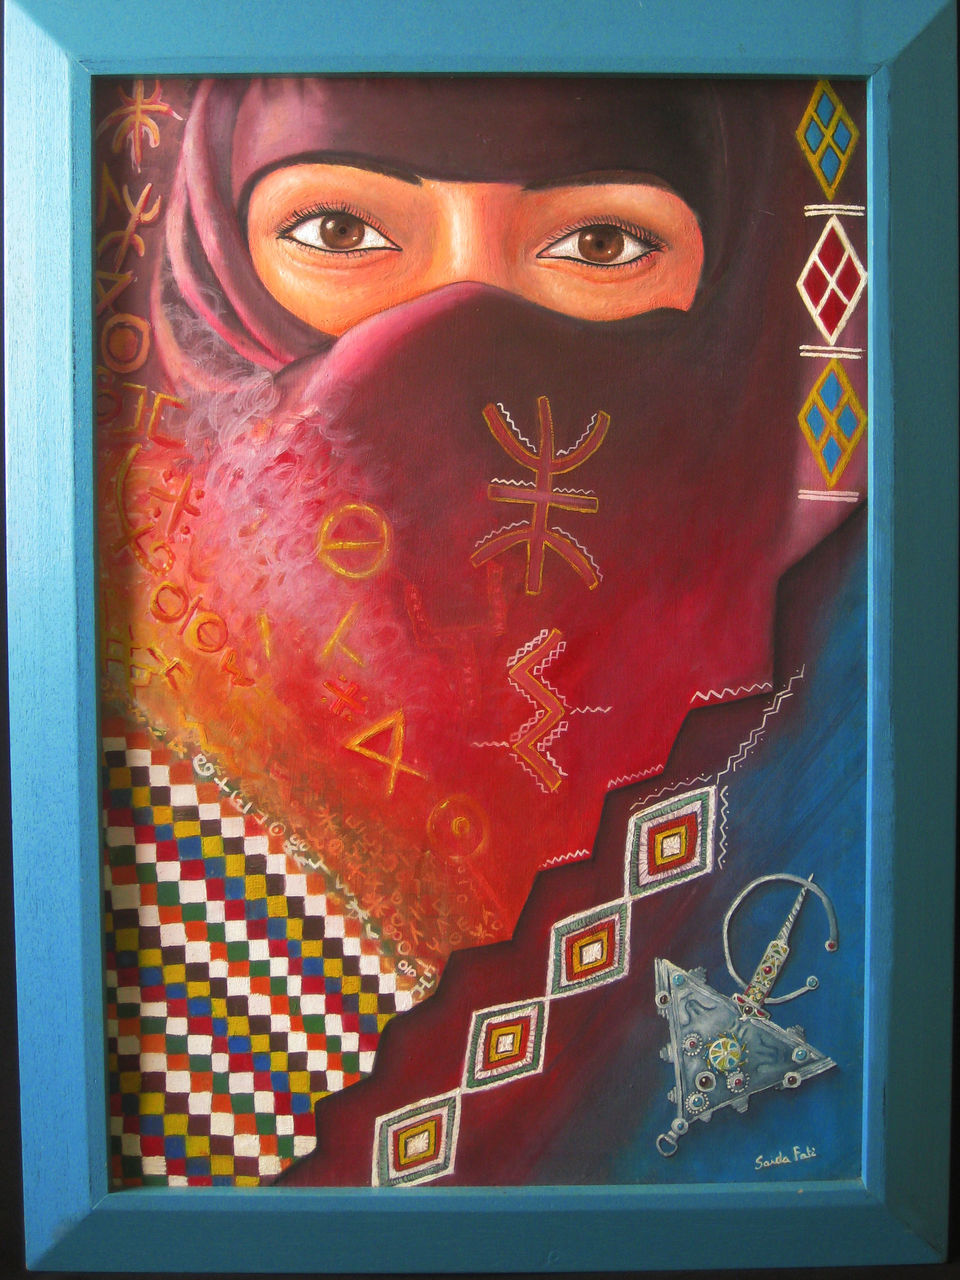 Saida Fati  سعيدة فاتي la femme amazighe source de la beautée artisanal